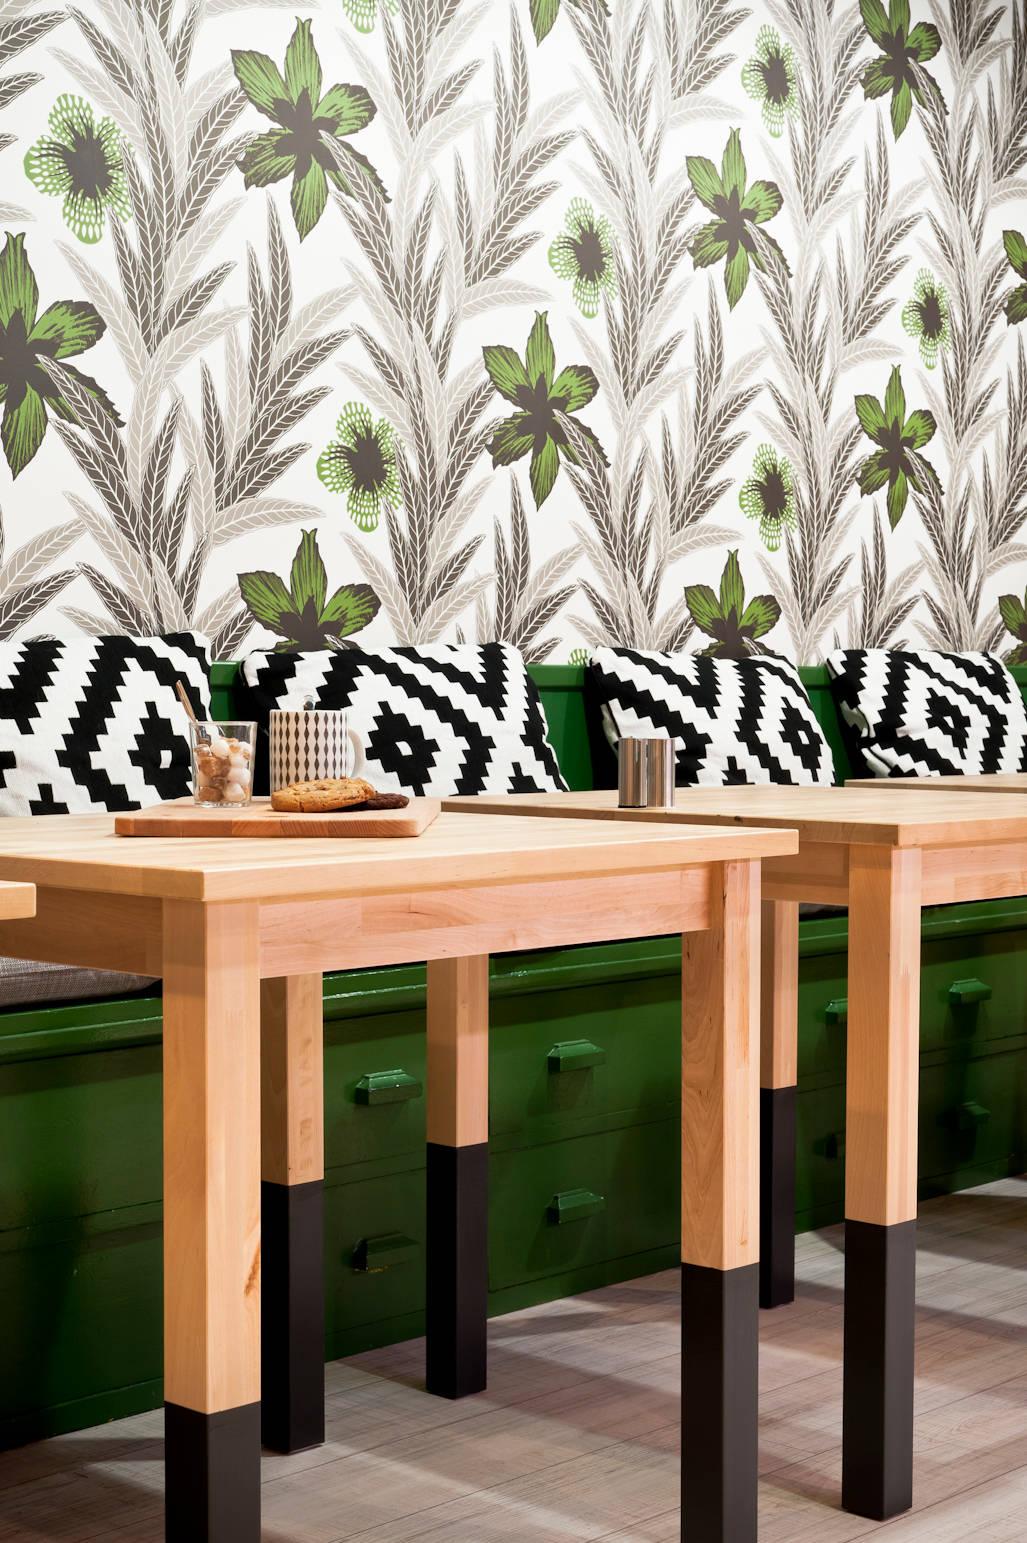 trendy place bagels von marie dumora homify. Black Bedroom Furniture Sets. Home Design Ideas